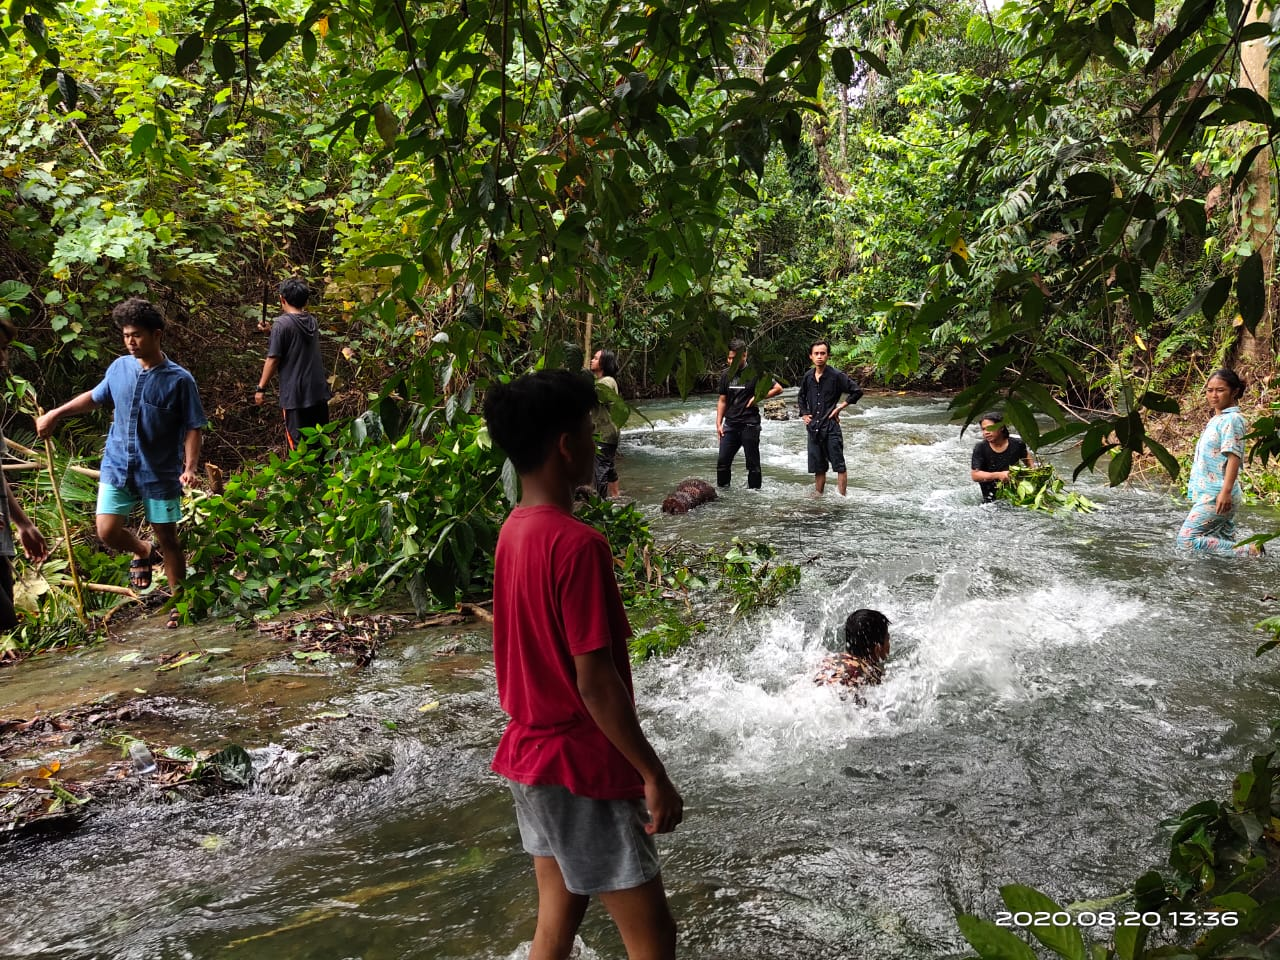 Sukses Meriahkan Hari Kemerdekaan, Pemuda BMB Gelar Penerimaan Hadiah di Wisata Sungai Balambano